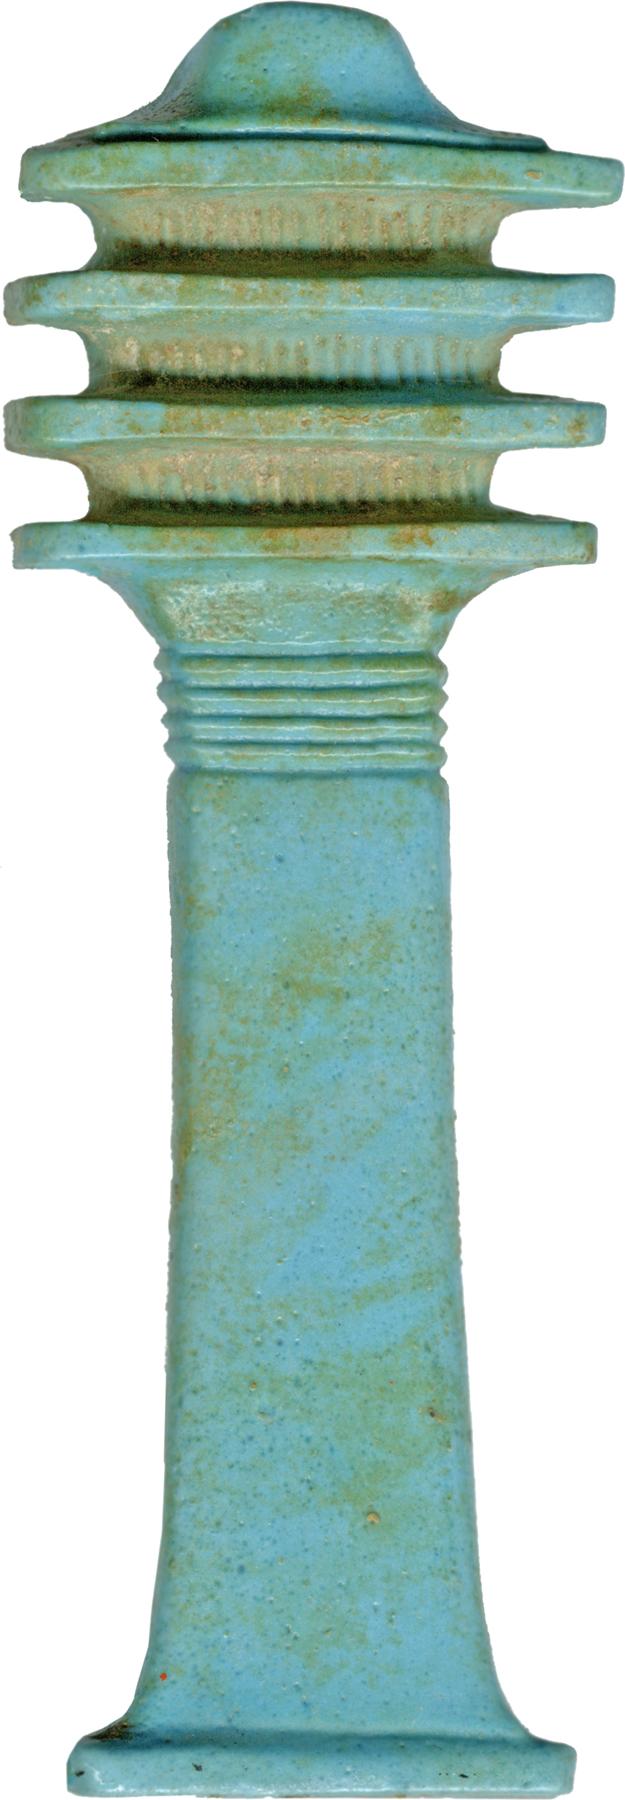 file egyptian   djed pillar   walters 481628